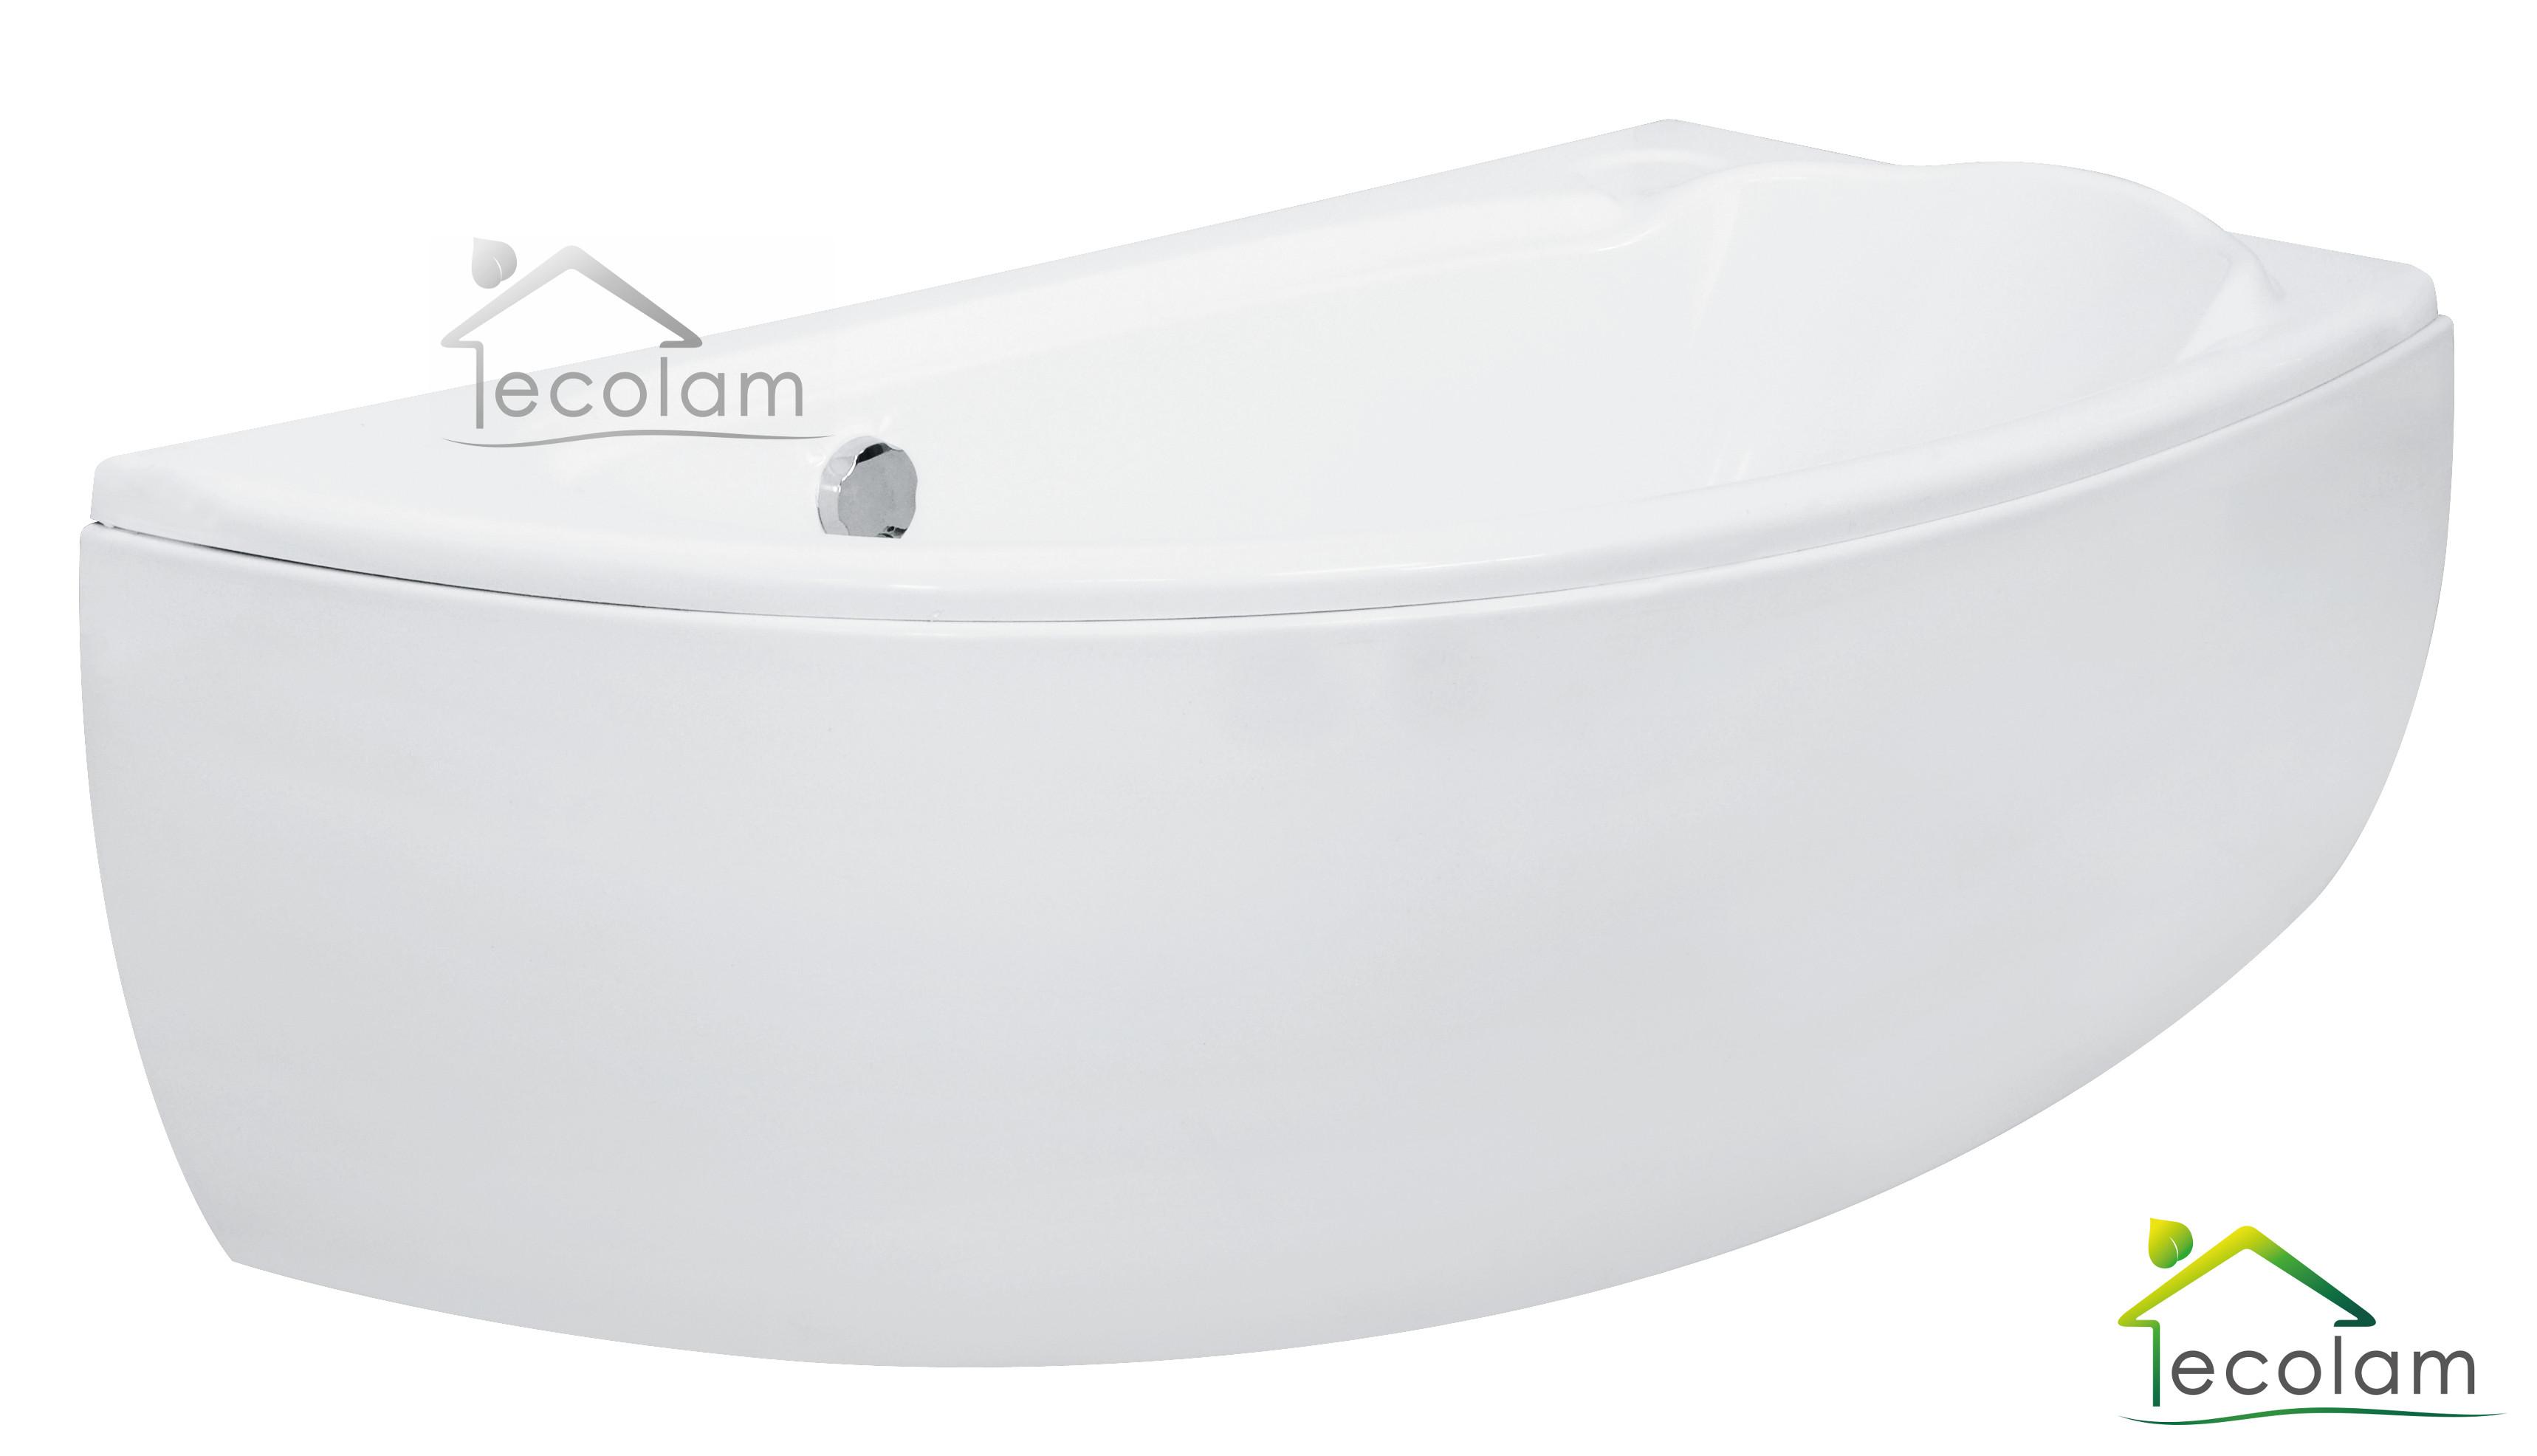 badewanne eckwanne acryl 150 x 70 cm sch rze ablaufgarnitur silikon rechts m ebay. Black Bedroom Furniture Sets. Home Design Ideas